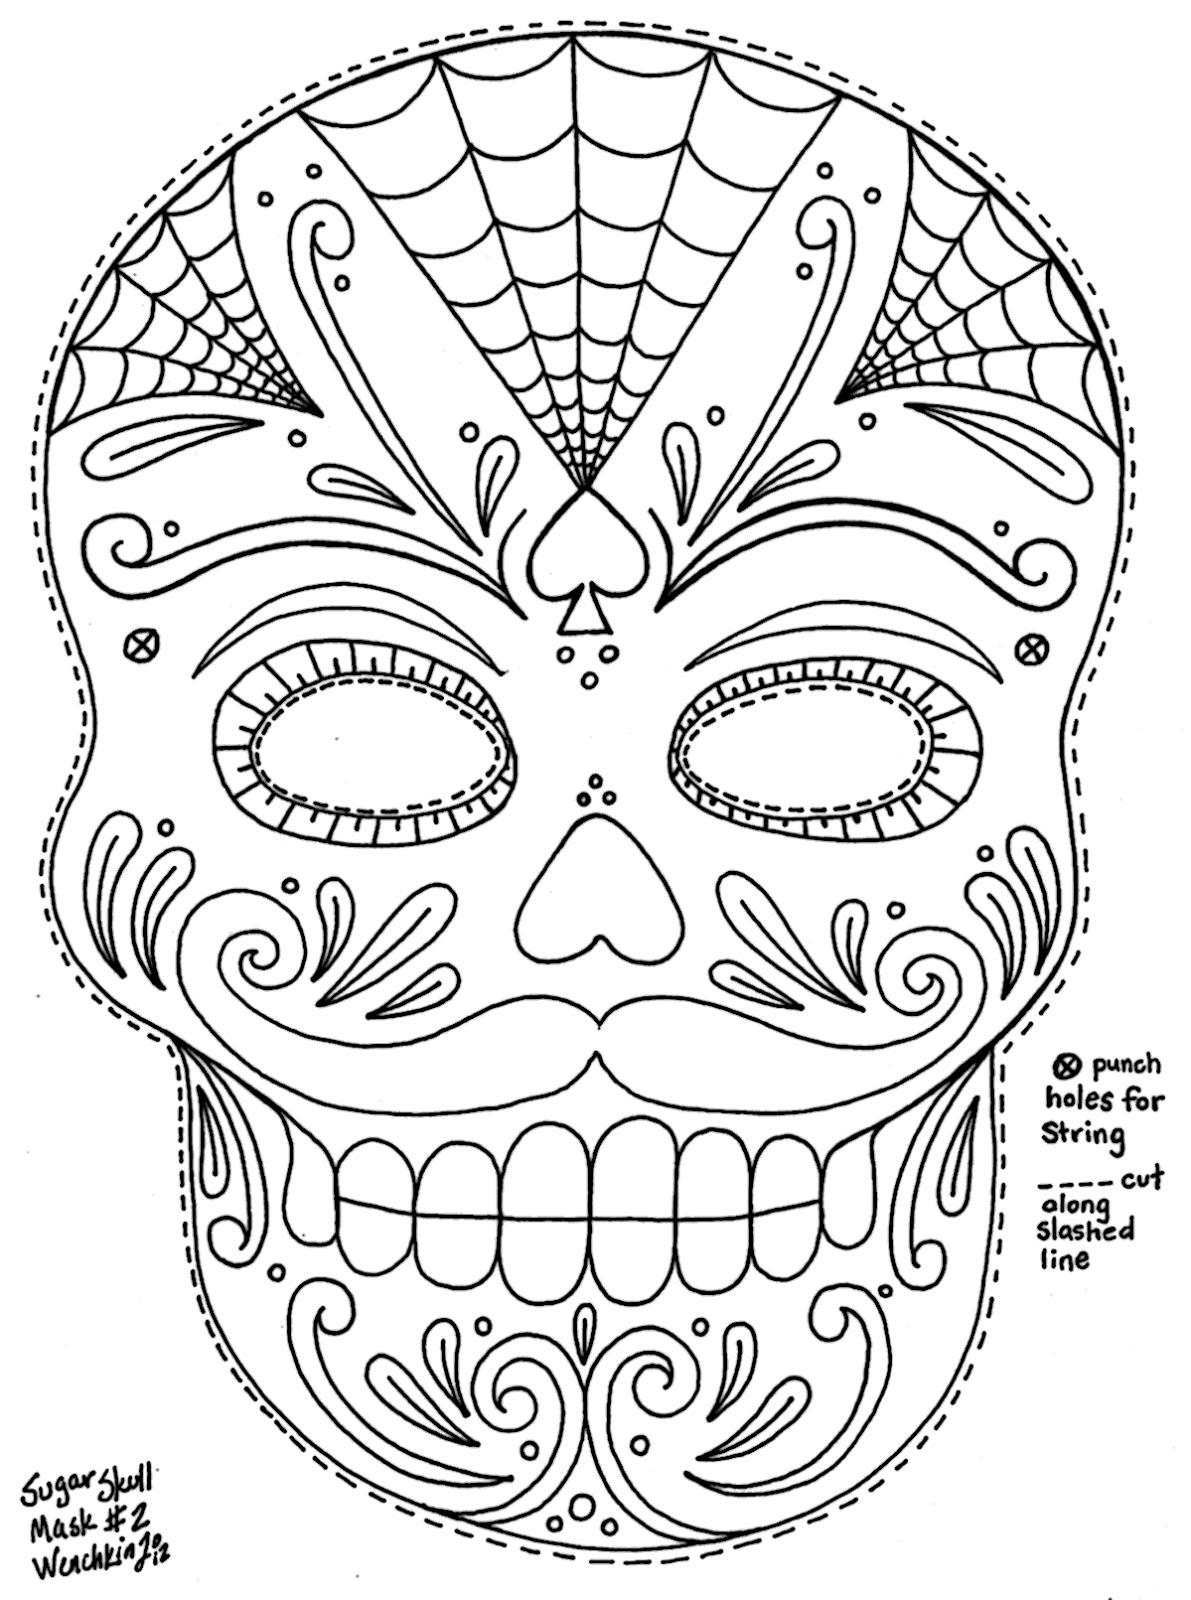 Fiesta Drawing At Getdrawings